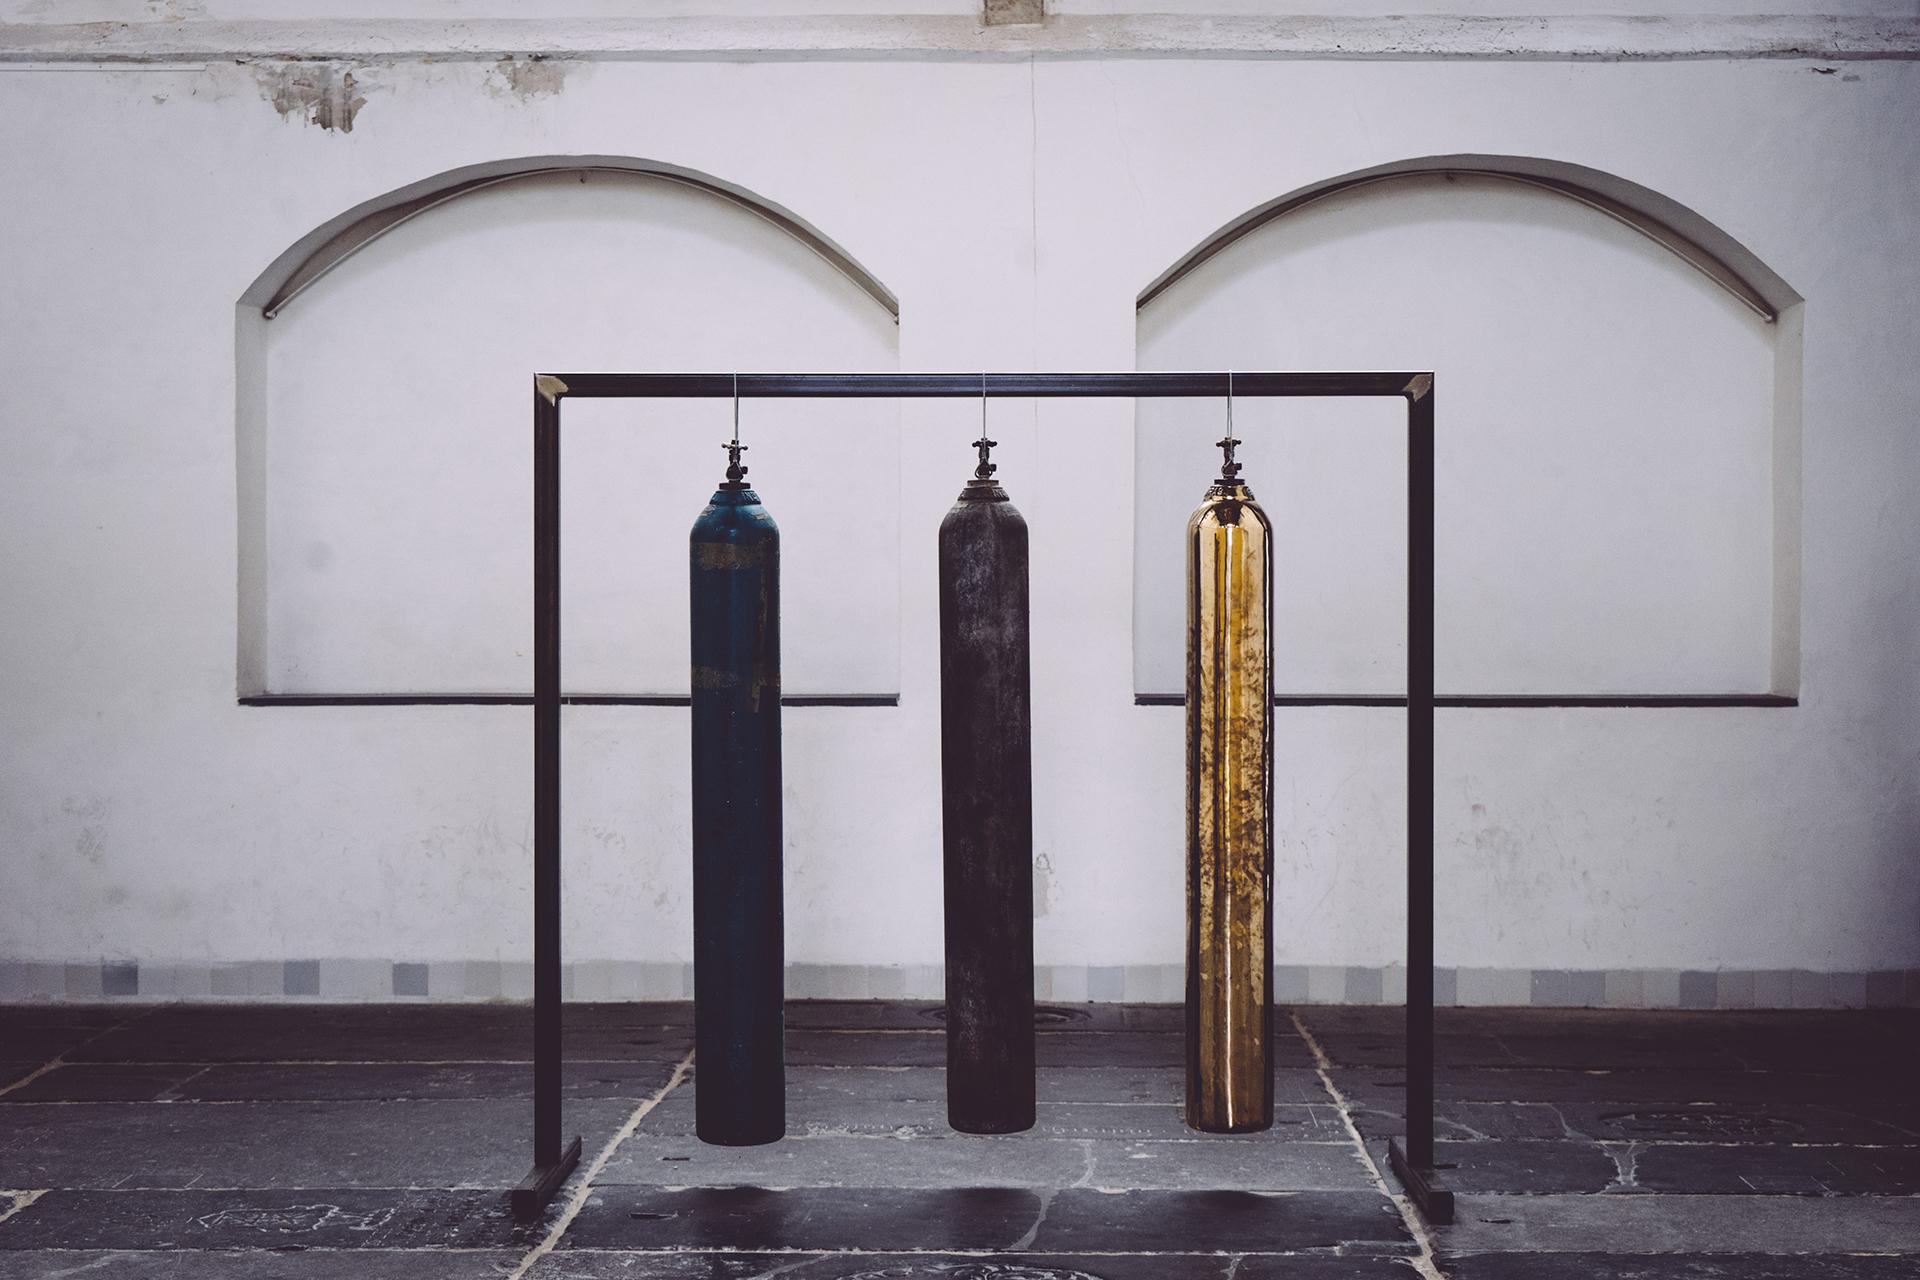 Seconde installation artistique dans la Oude Kerk